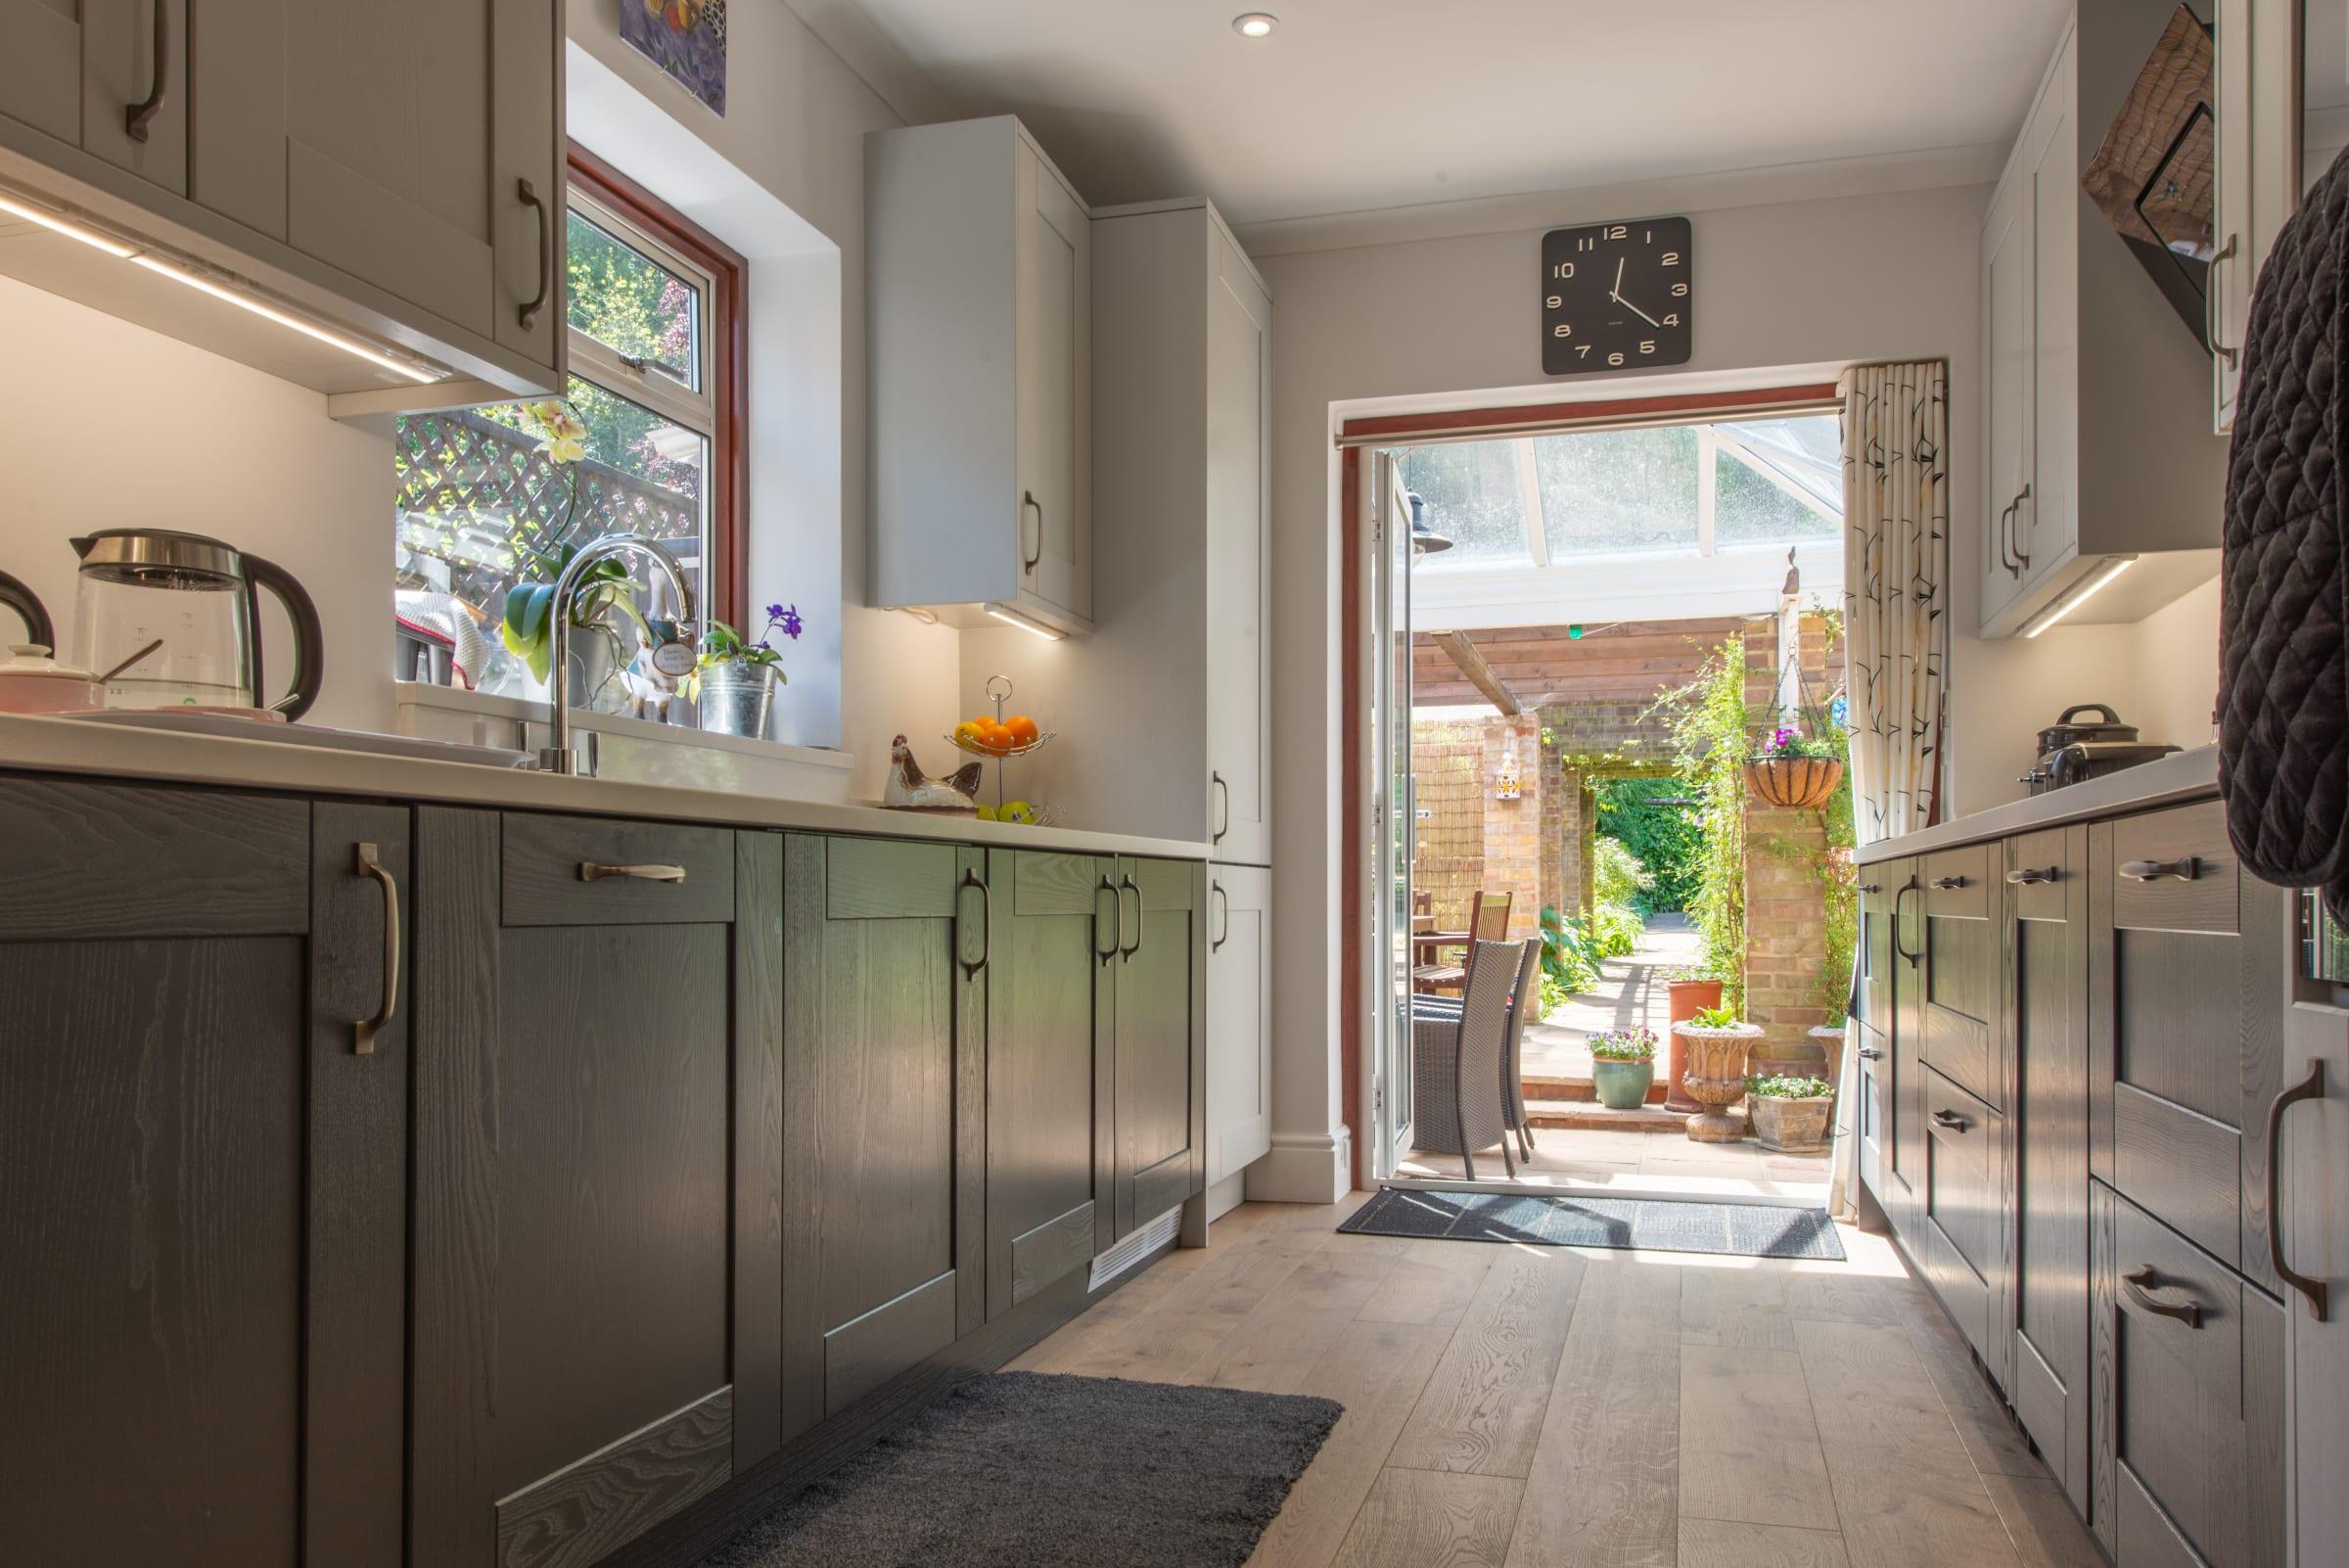 Deco frozen umber knaphill kitchen 4